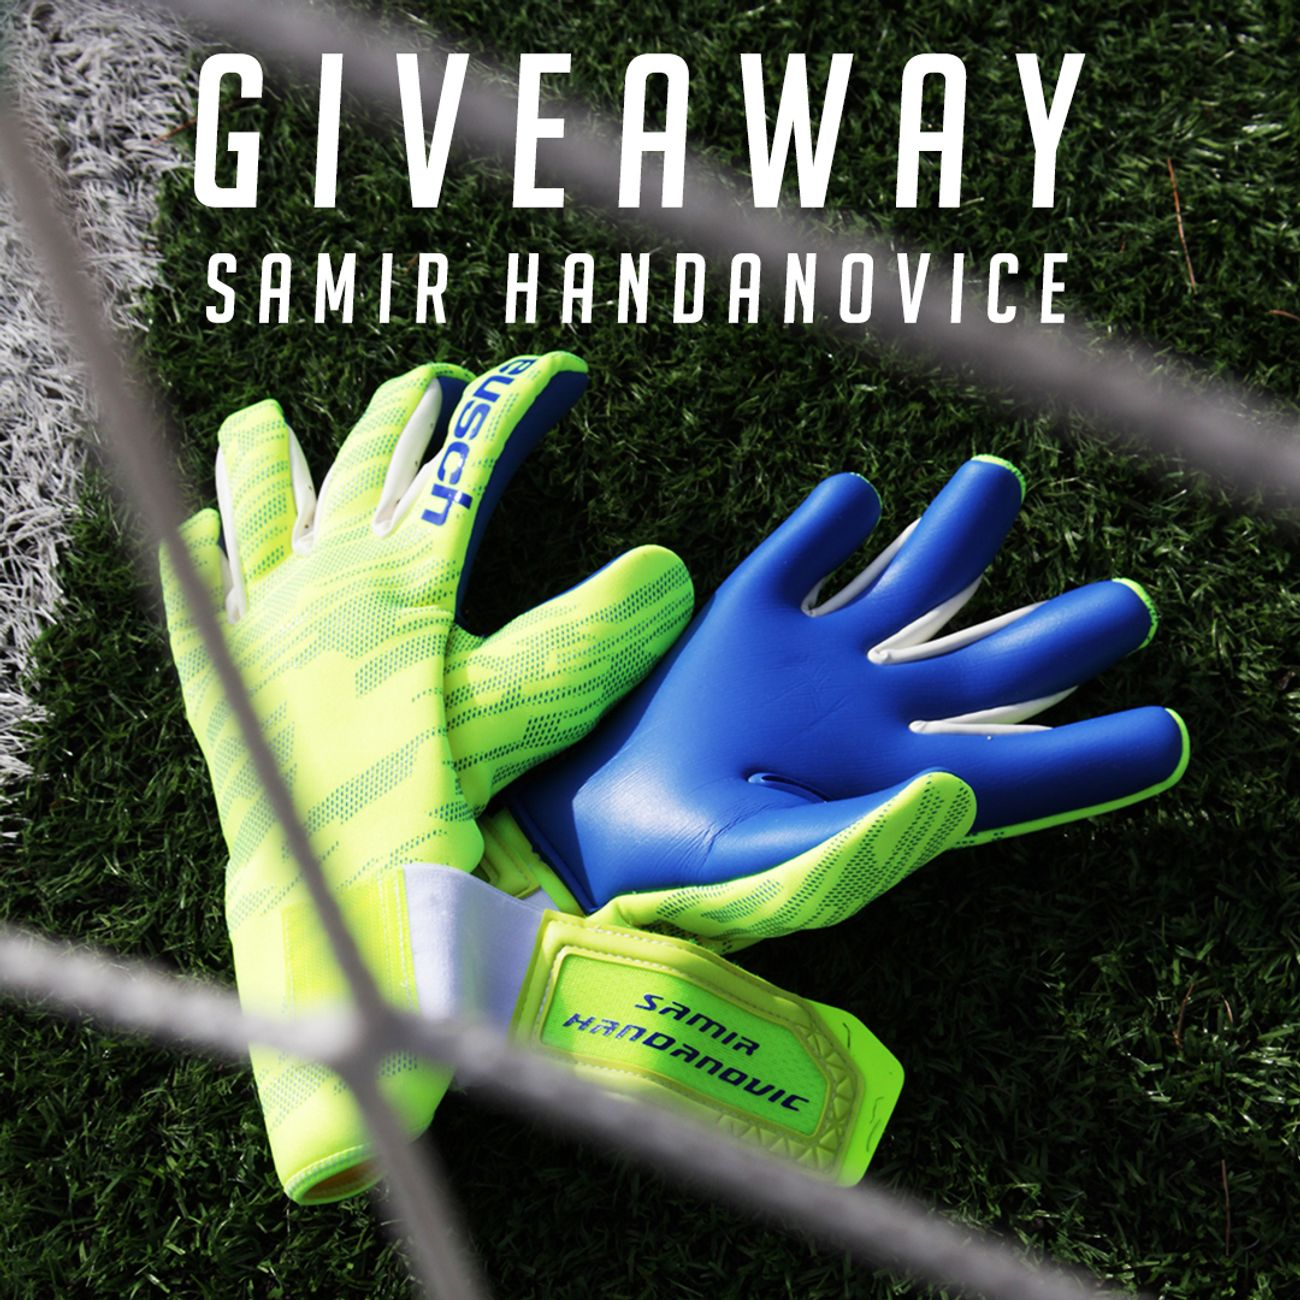 Samir Handanovic GIVEAWAY